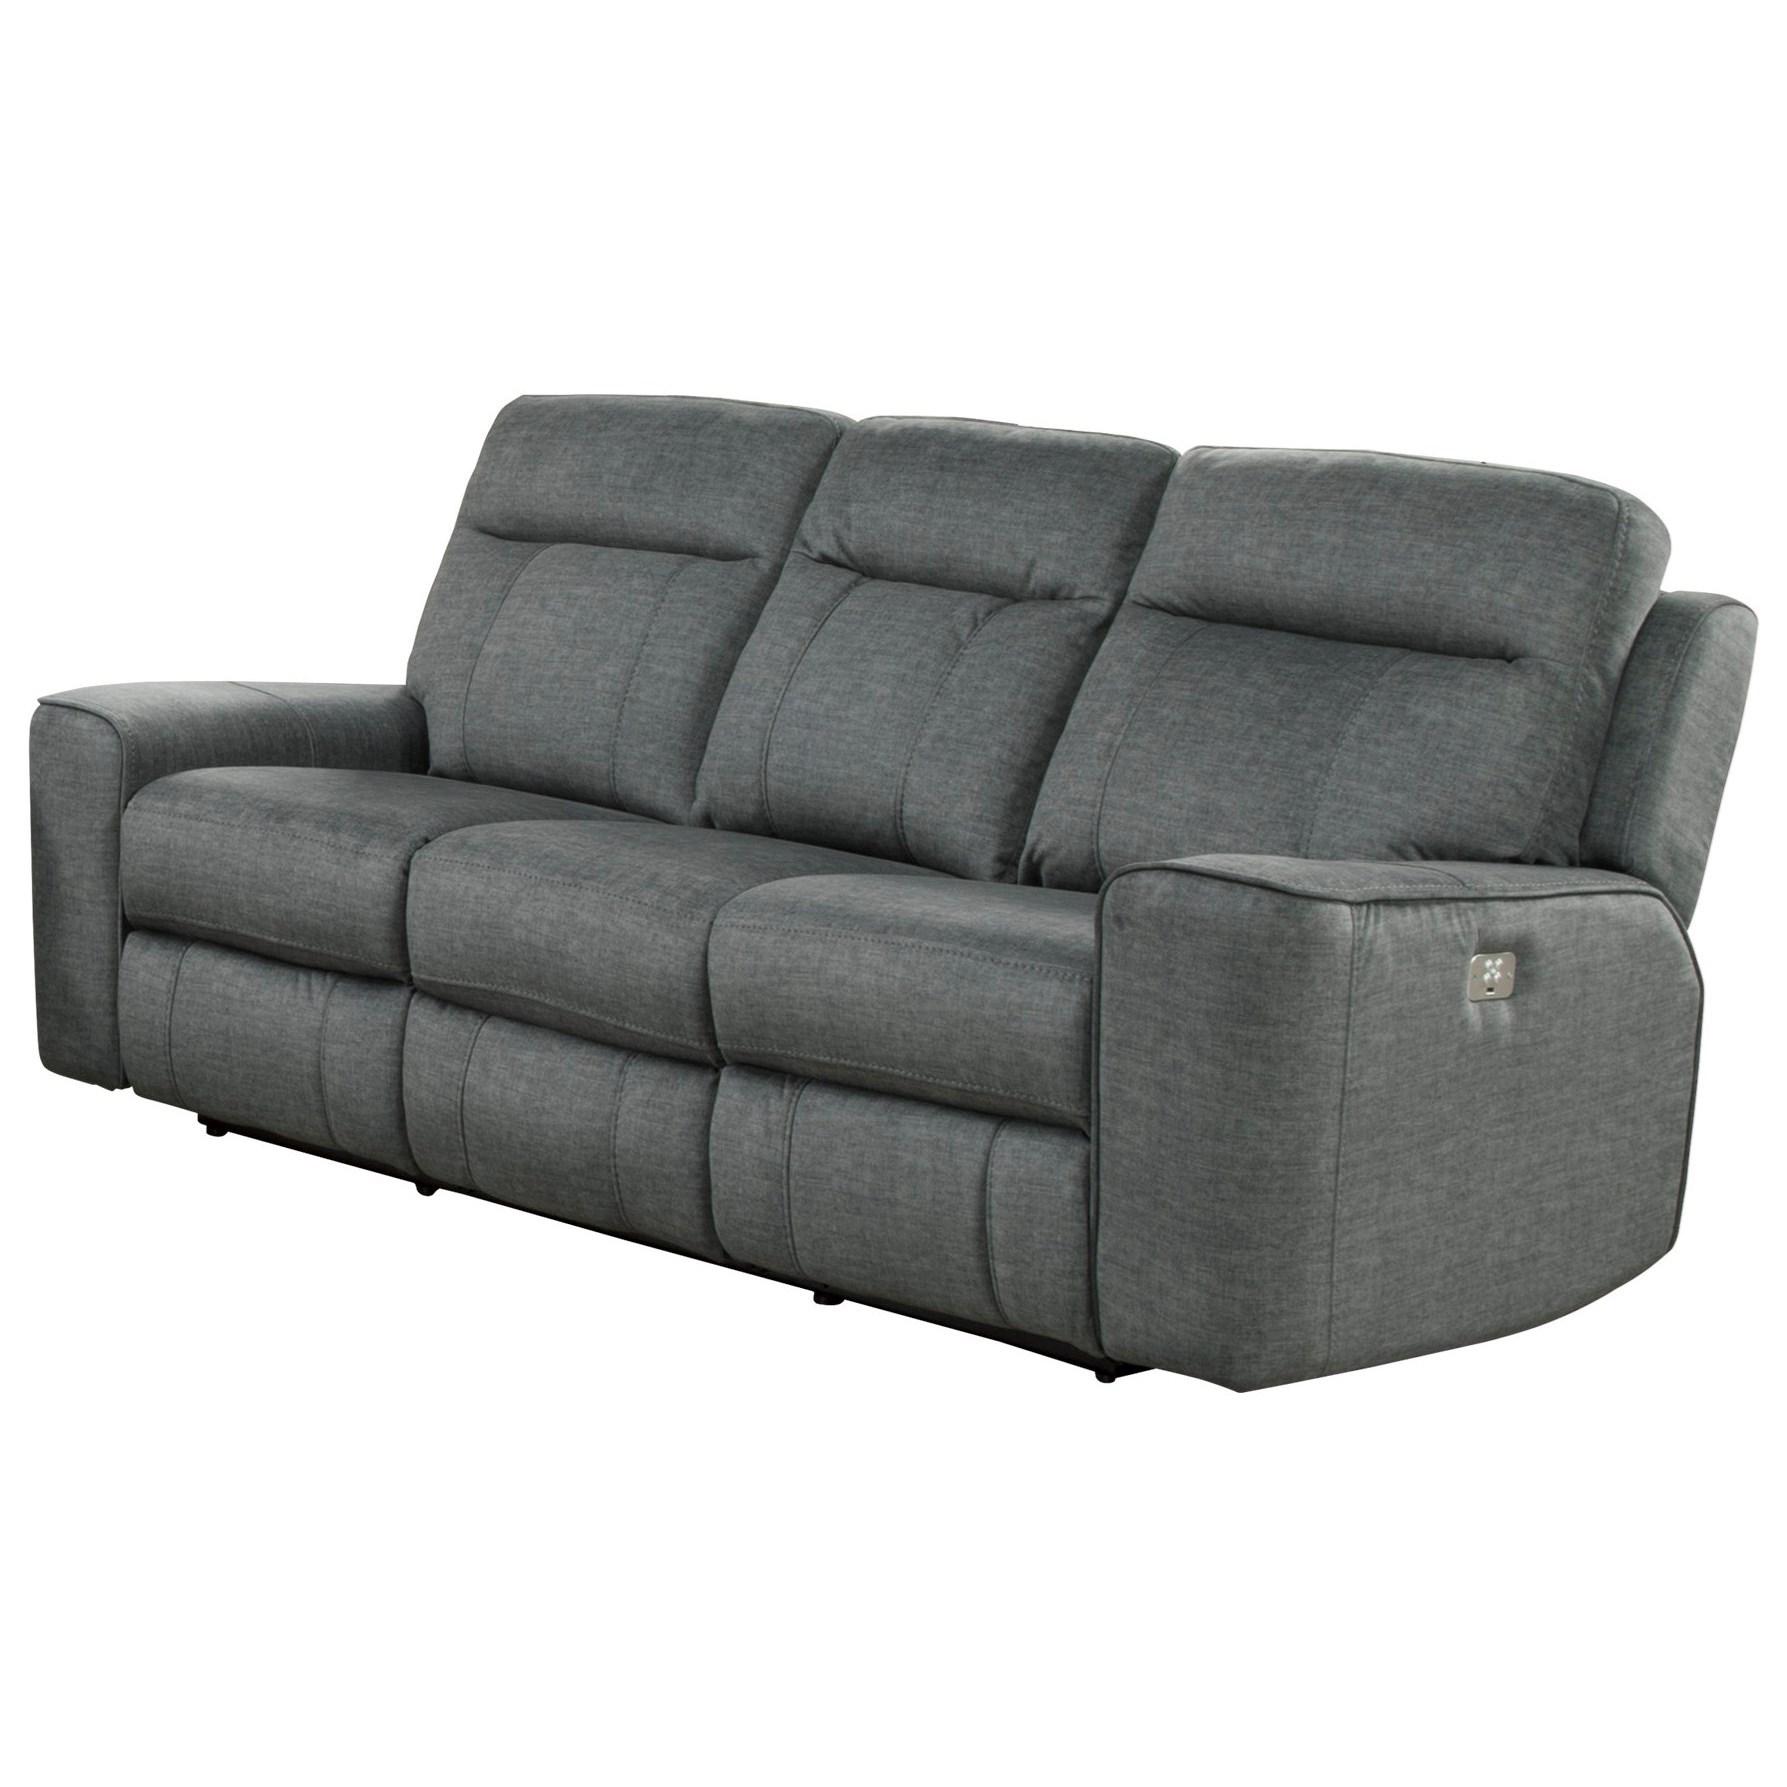 Power Dual Reclining Sofa w/ Power Headrest